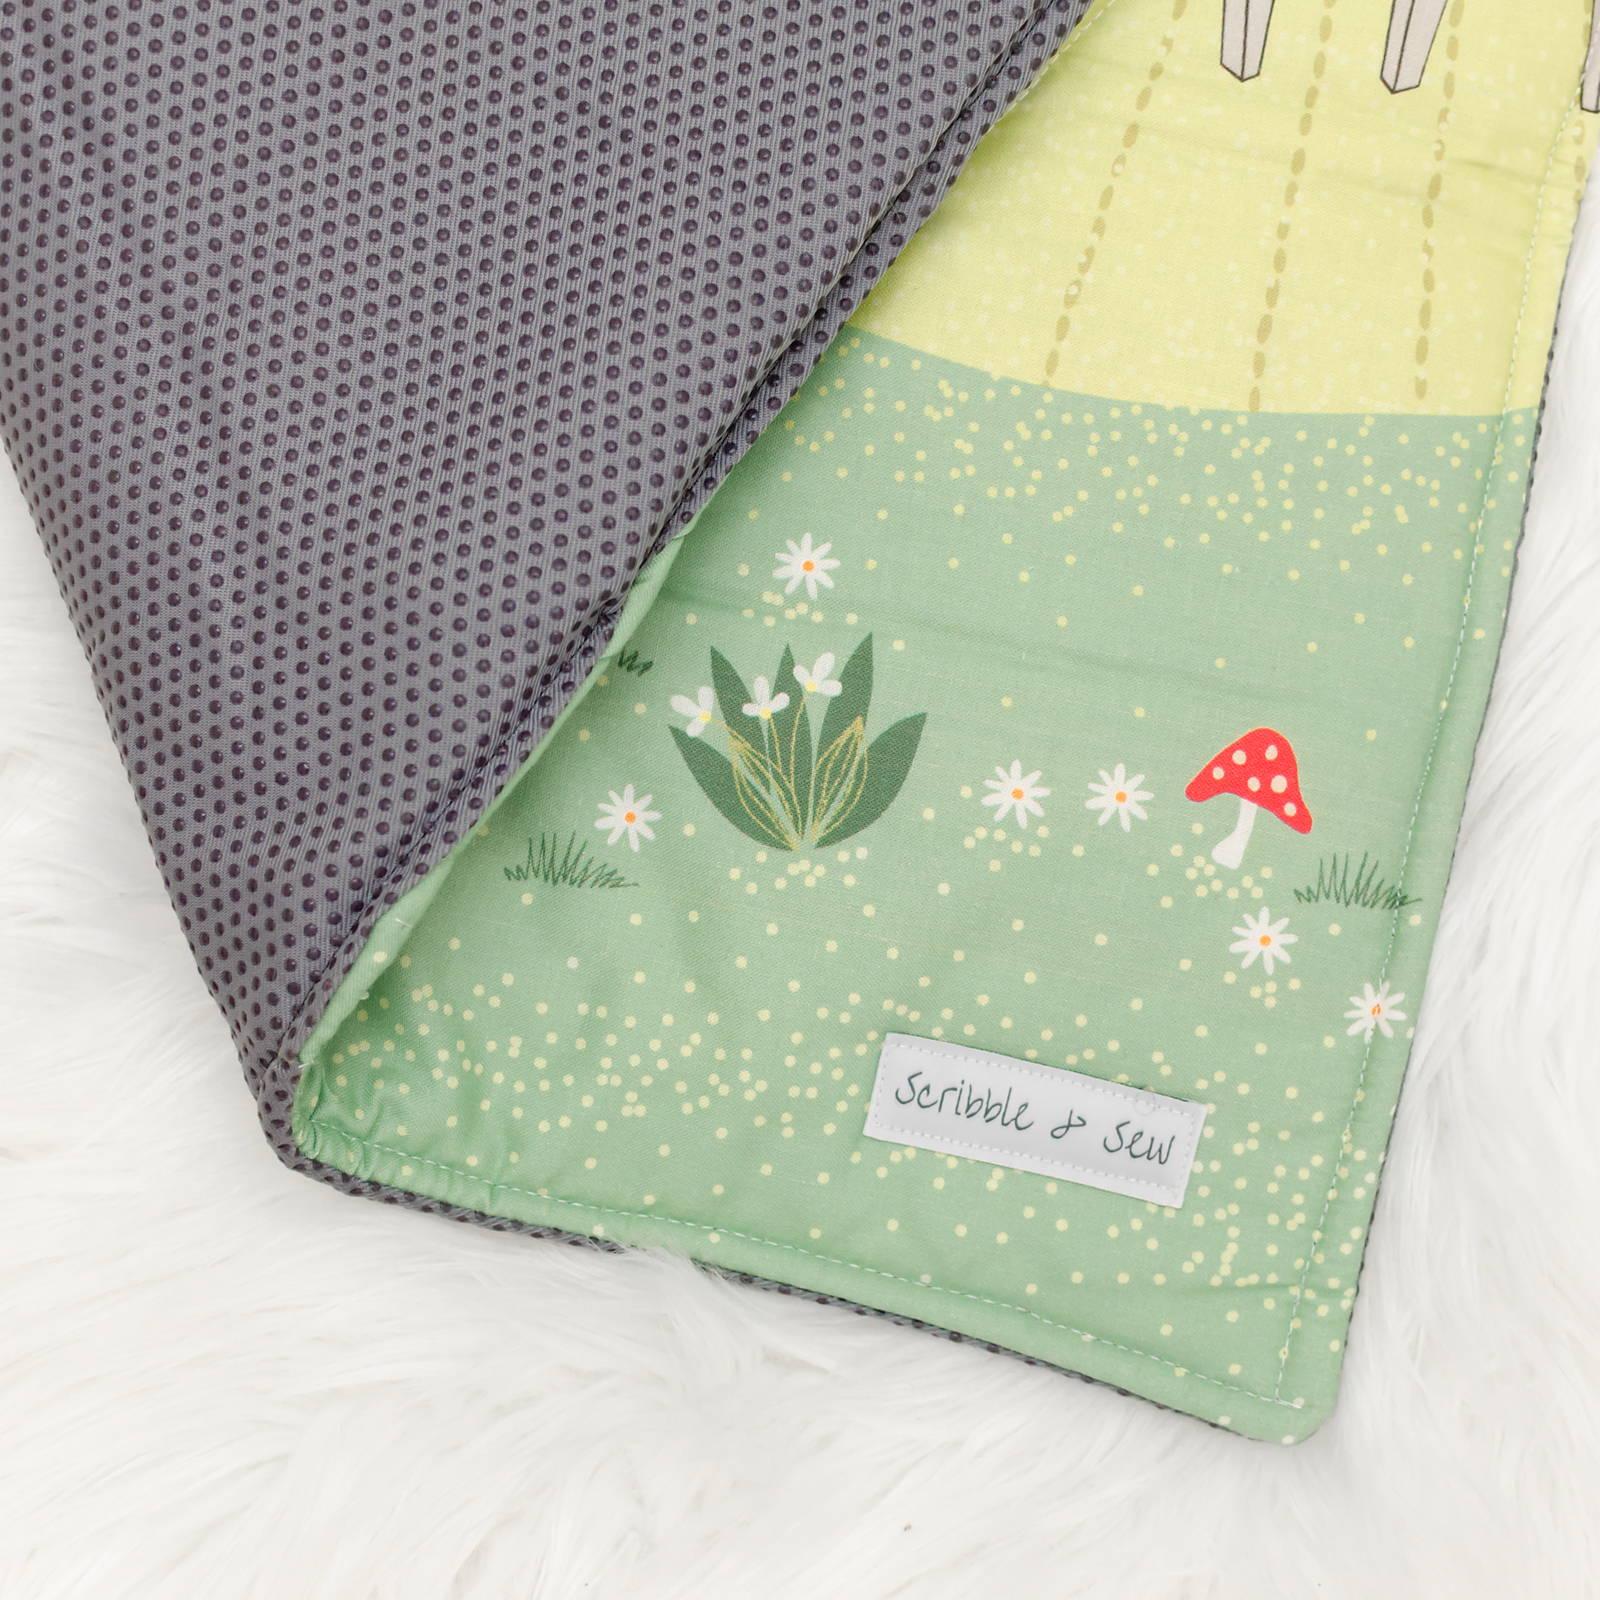 Scribble & Sew - Love Australian Handmade